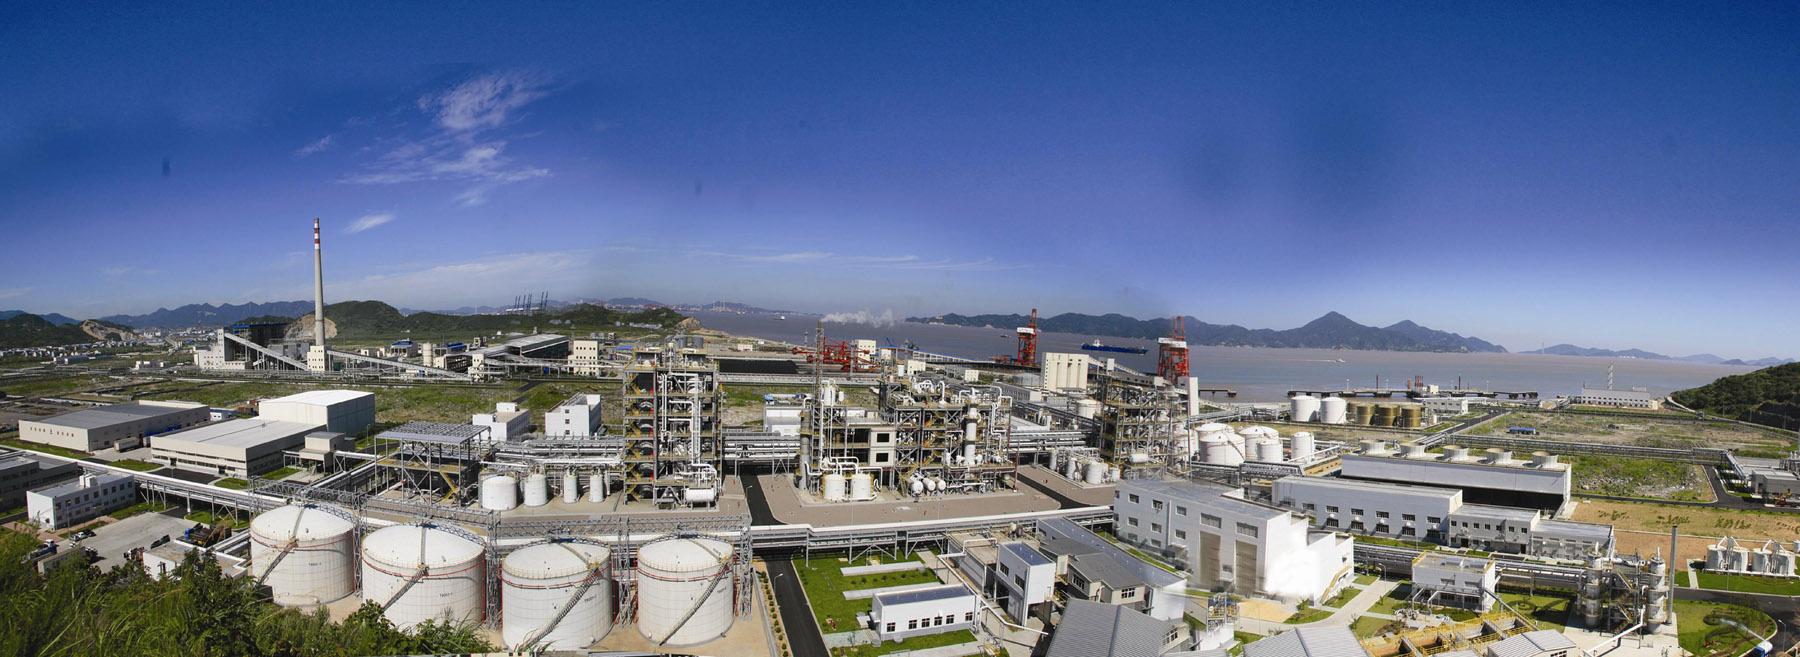 Wanhua Yantai Industrial Park in Yantai Shandong Province